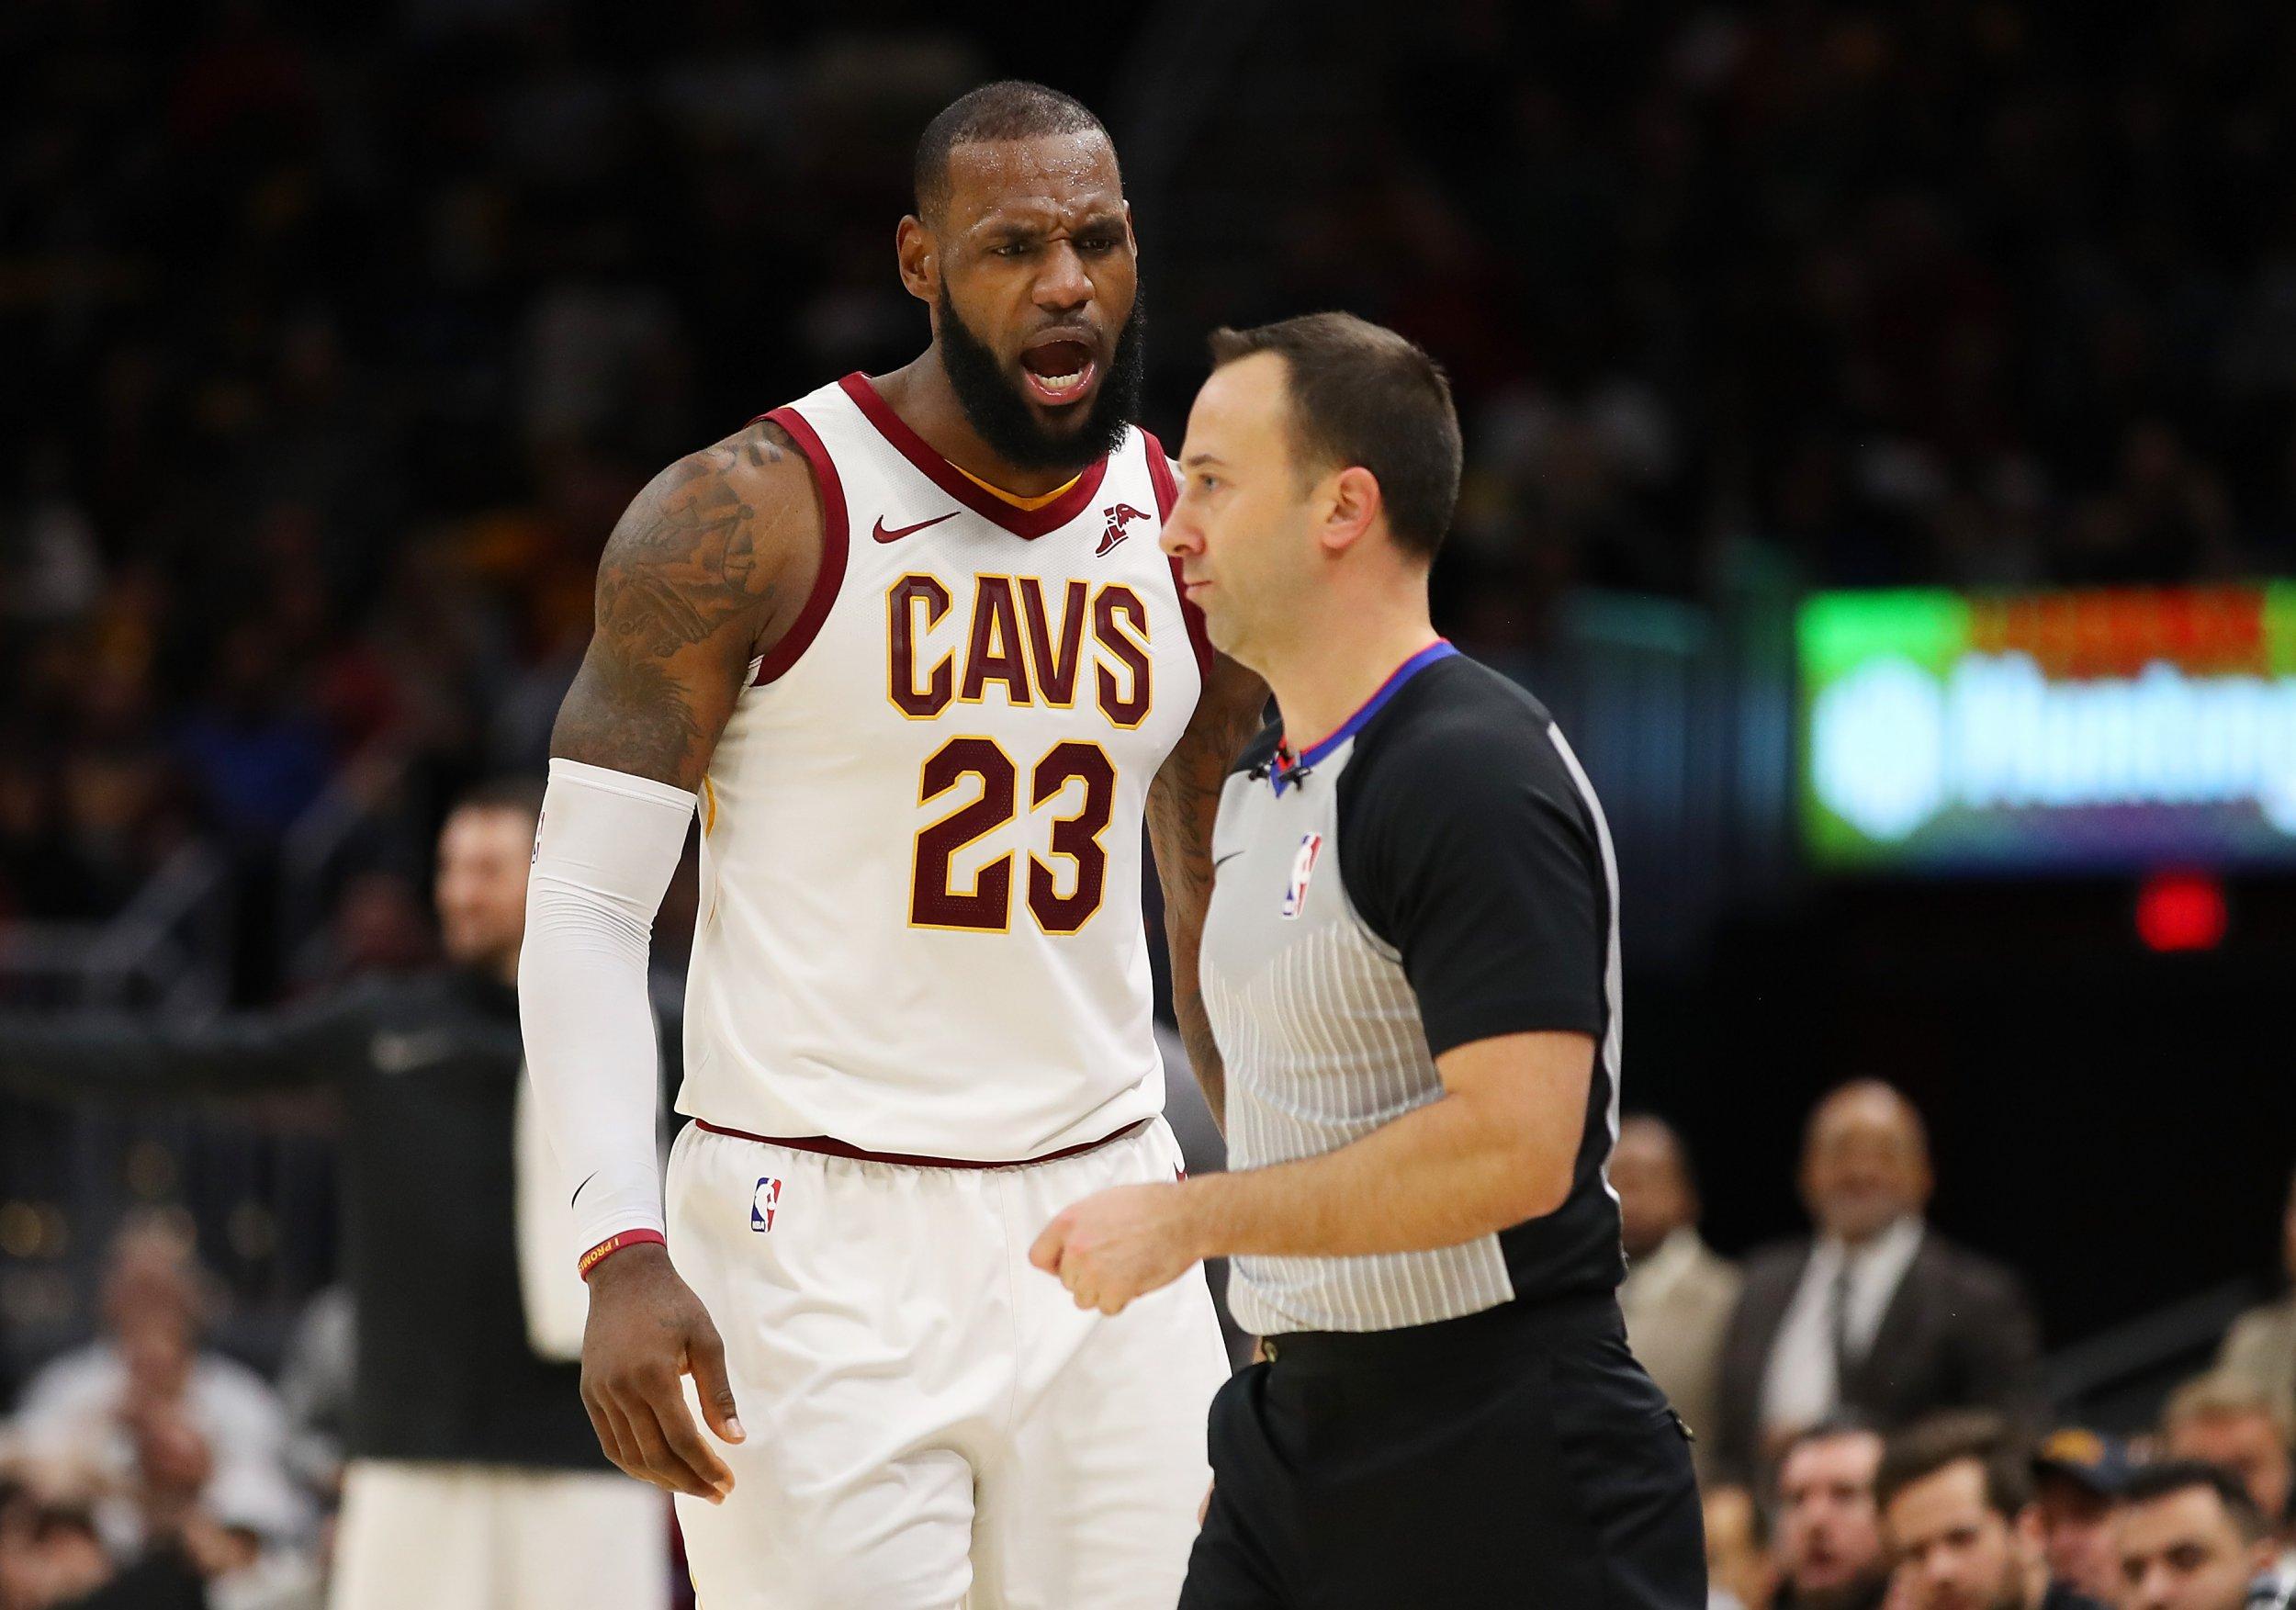 Cleveland Cavaliers forward LeBron James, left.